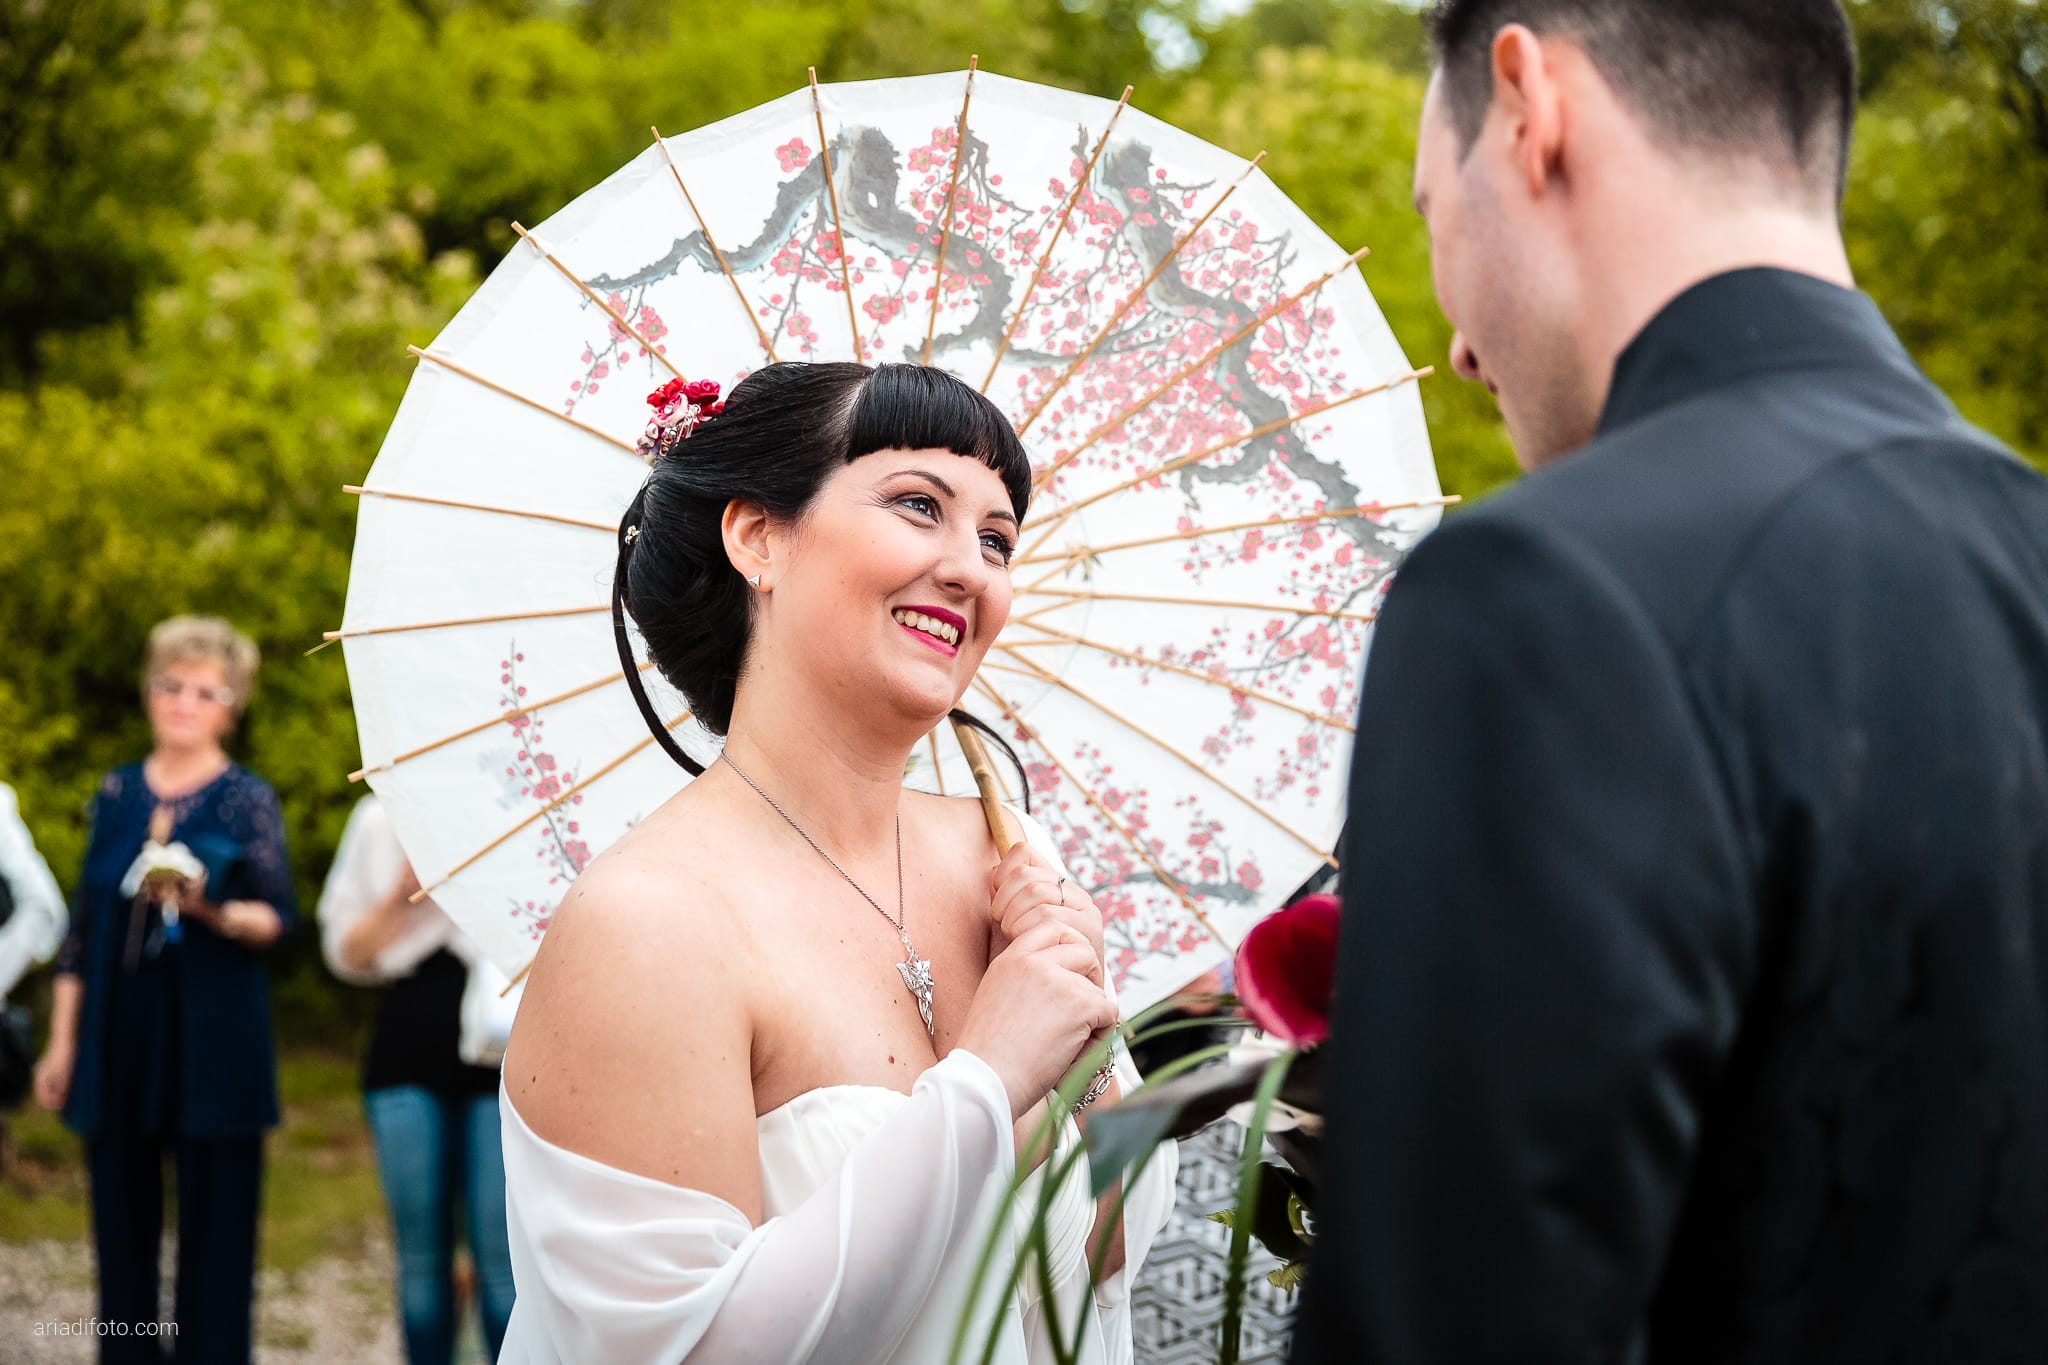 Agnese Alessandro Matrimonio Centro Visite Gradina Doberdo Gorizia Farra cerimonia ingresso sposa